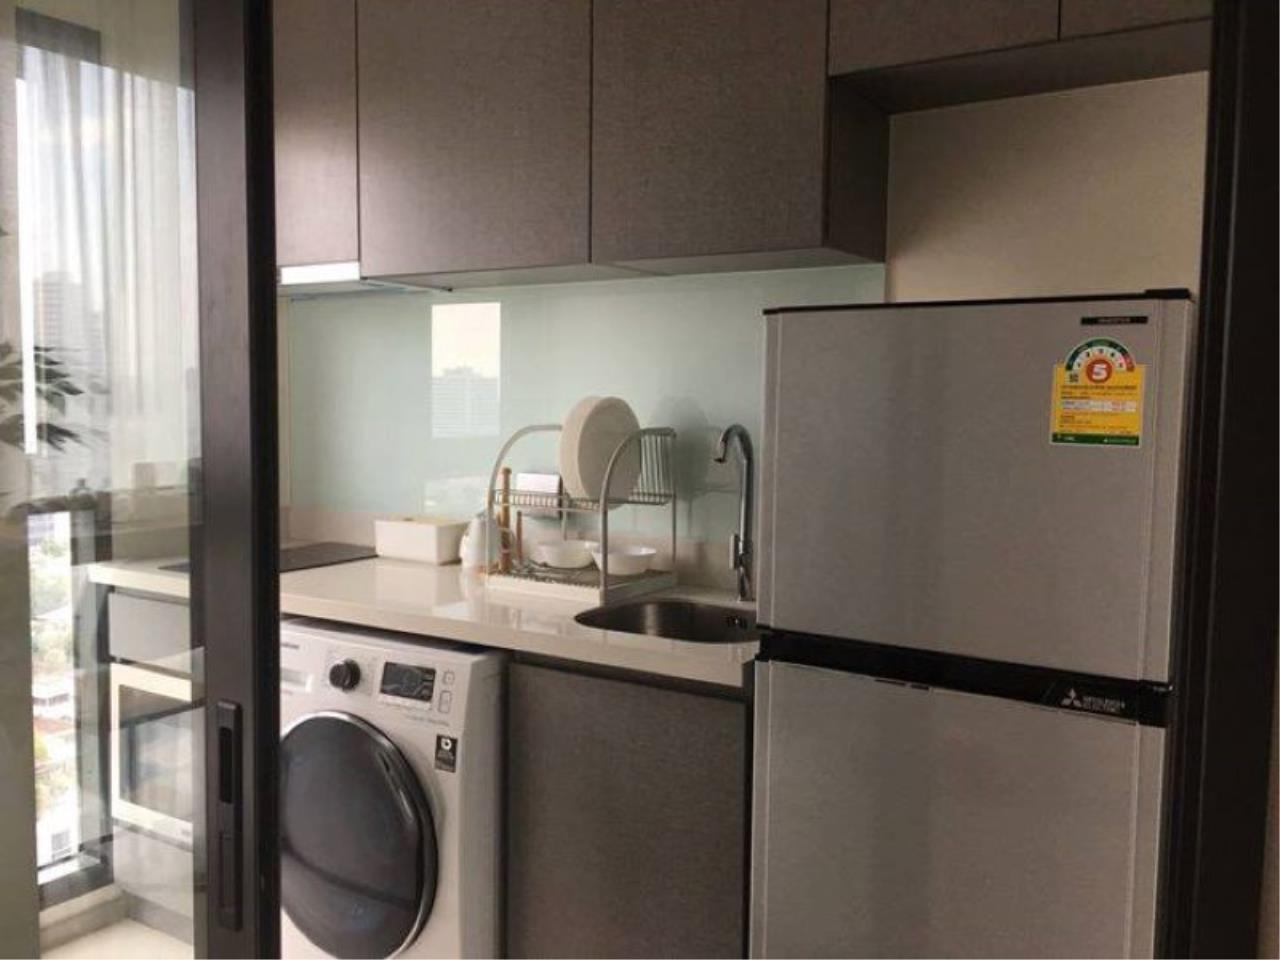 Century21 Skylux Agency's Rhythm Sukhumvit 36-38 / Condo For Rent / 1 Bedroom / 34 SQM / BTS Thong Lo / Bangkok 6